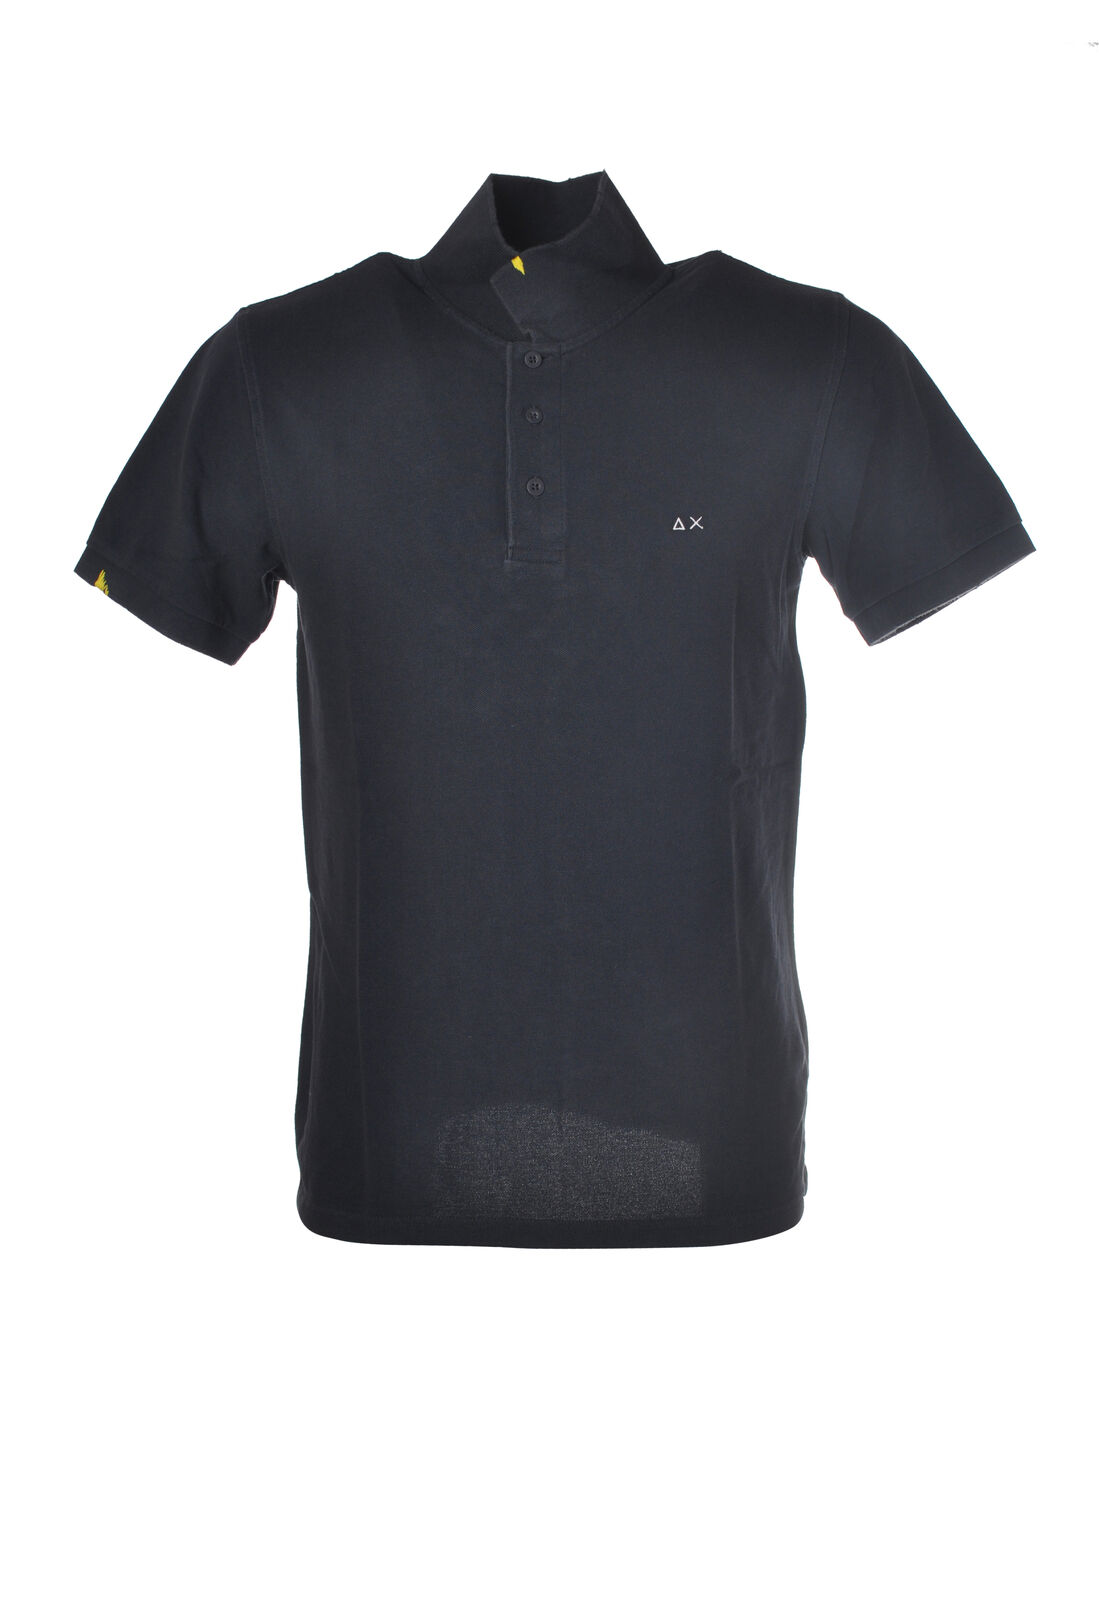 Sun 68 - Topwear-Polo - Man - bluee - 5999613C191432